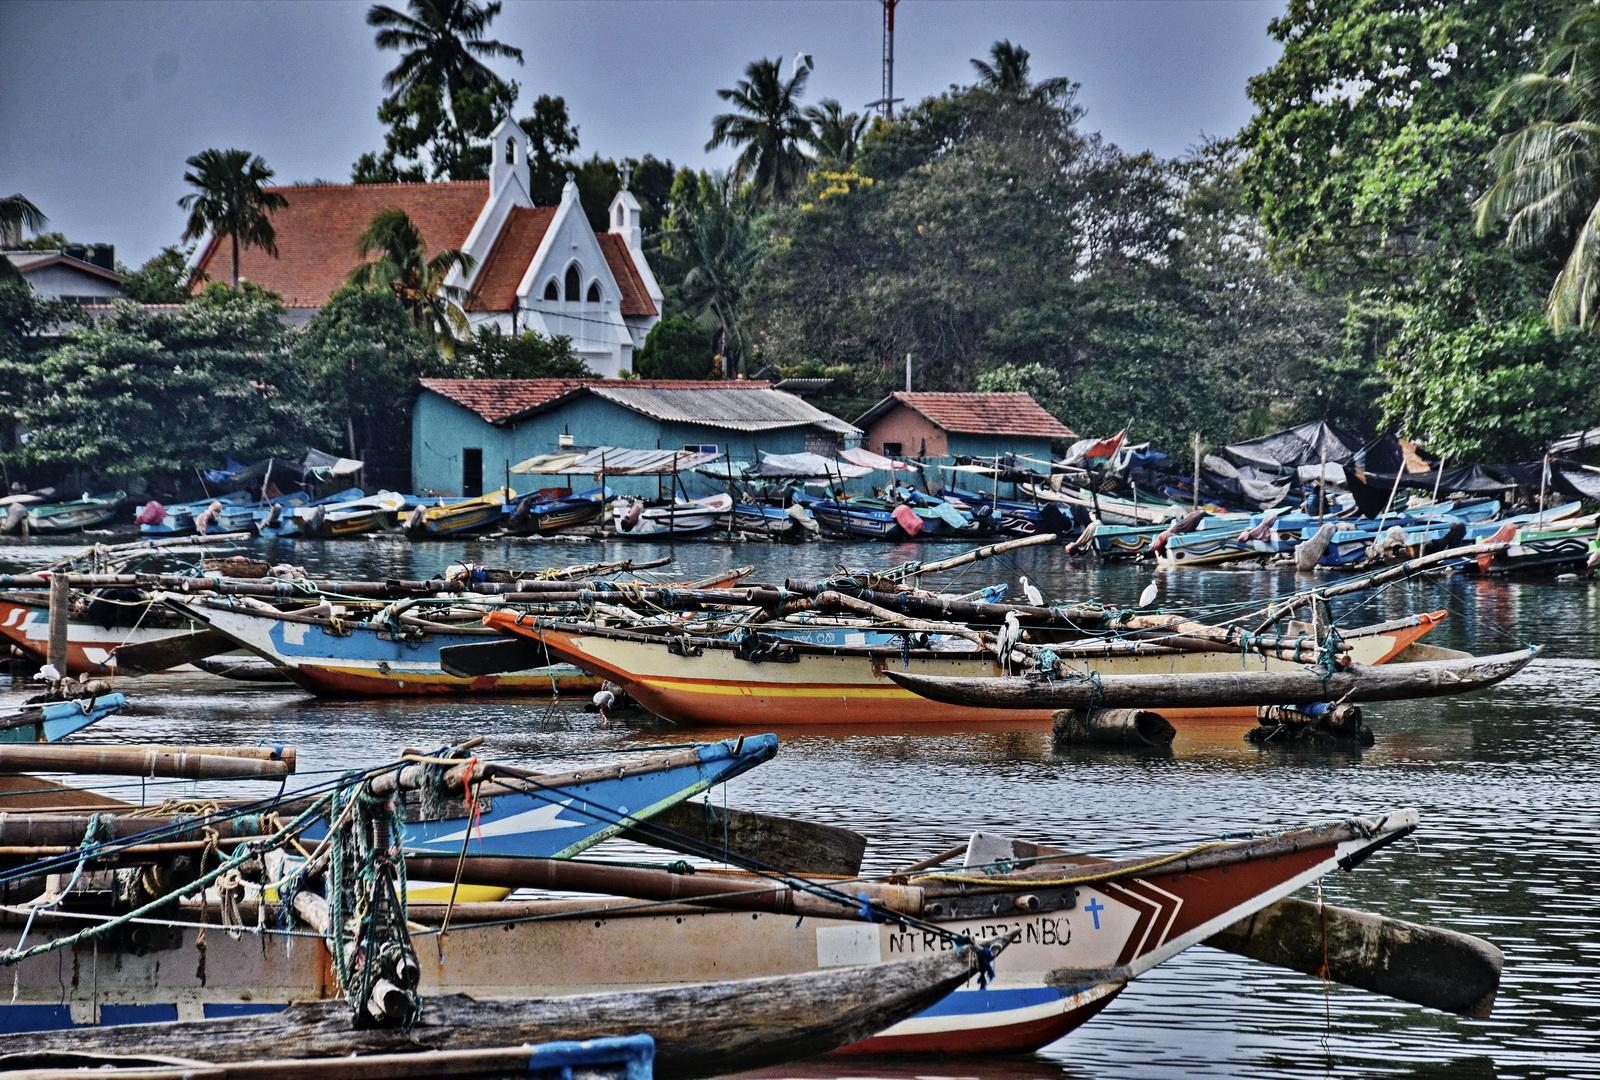 Sri Lanka, Negombo port